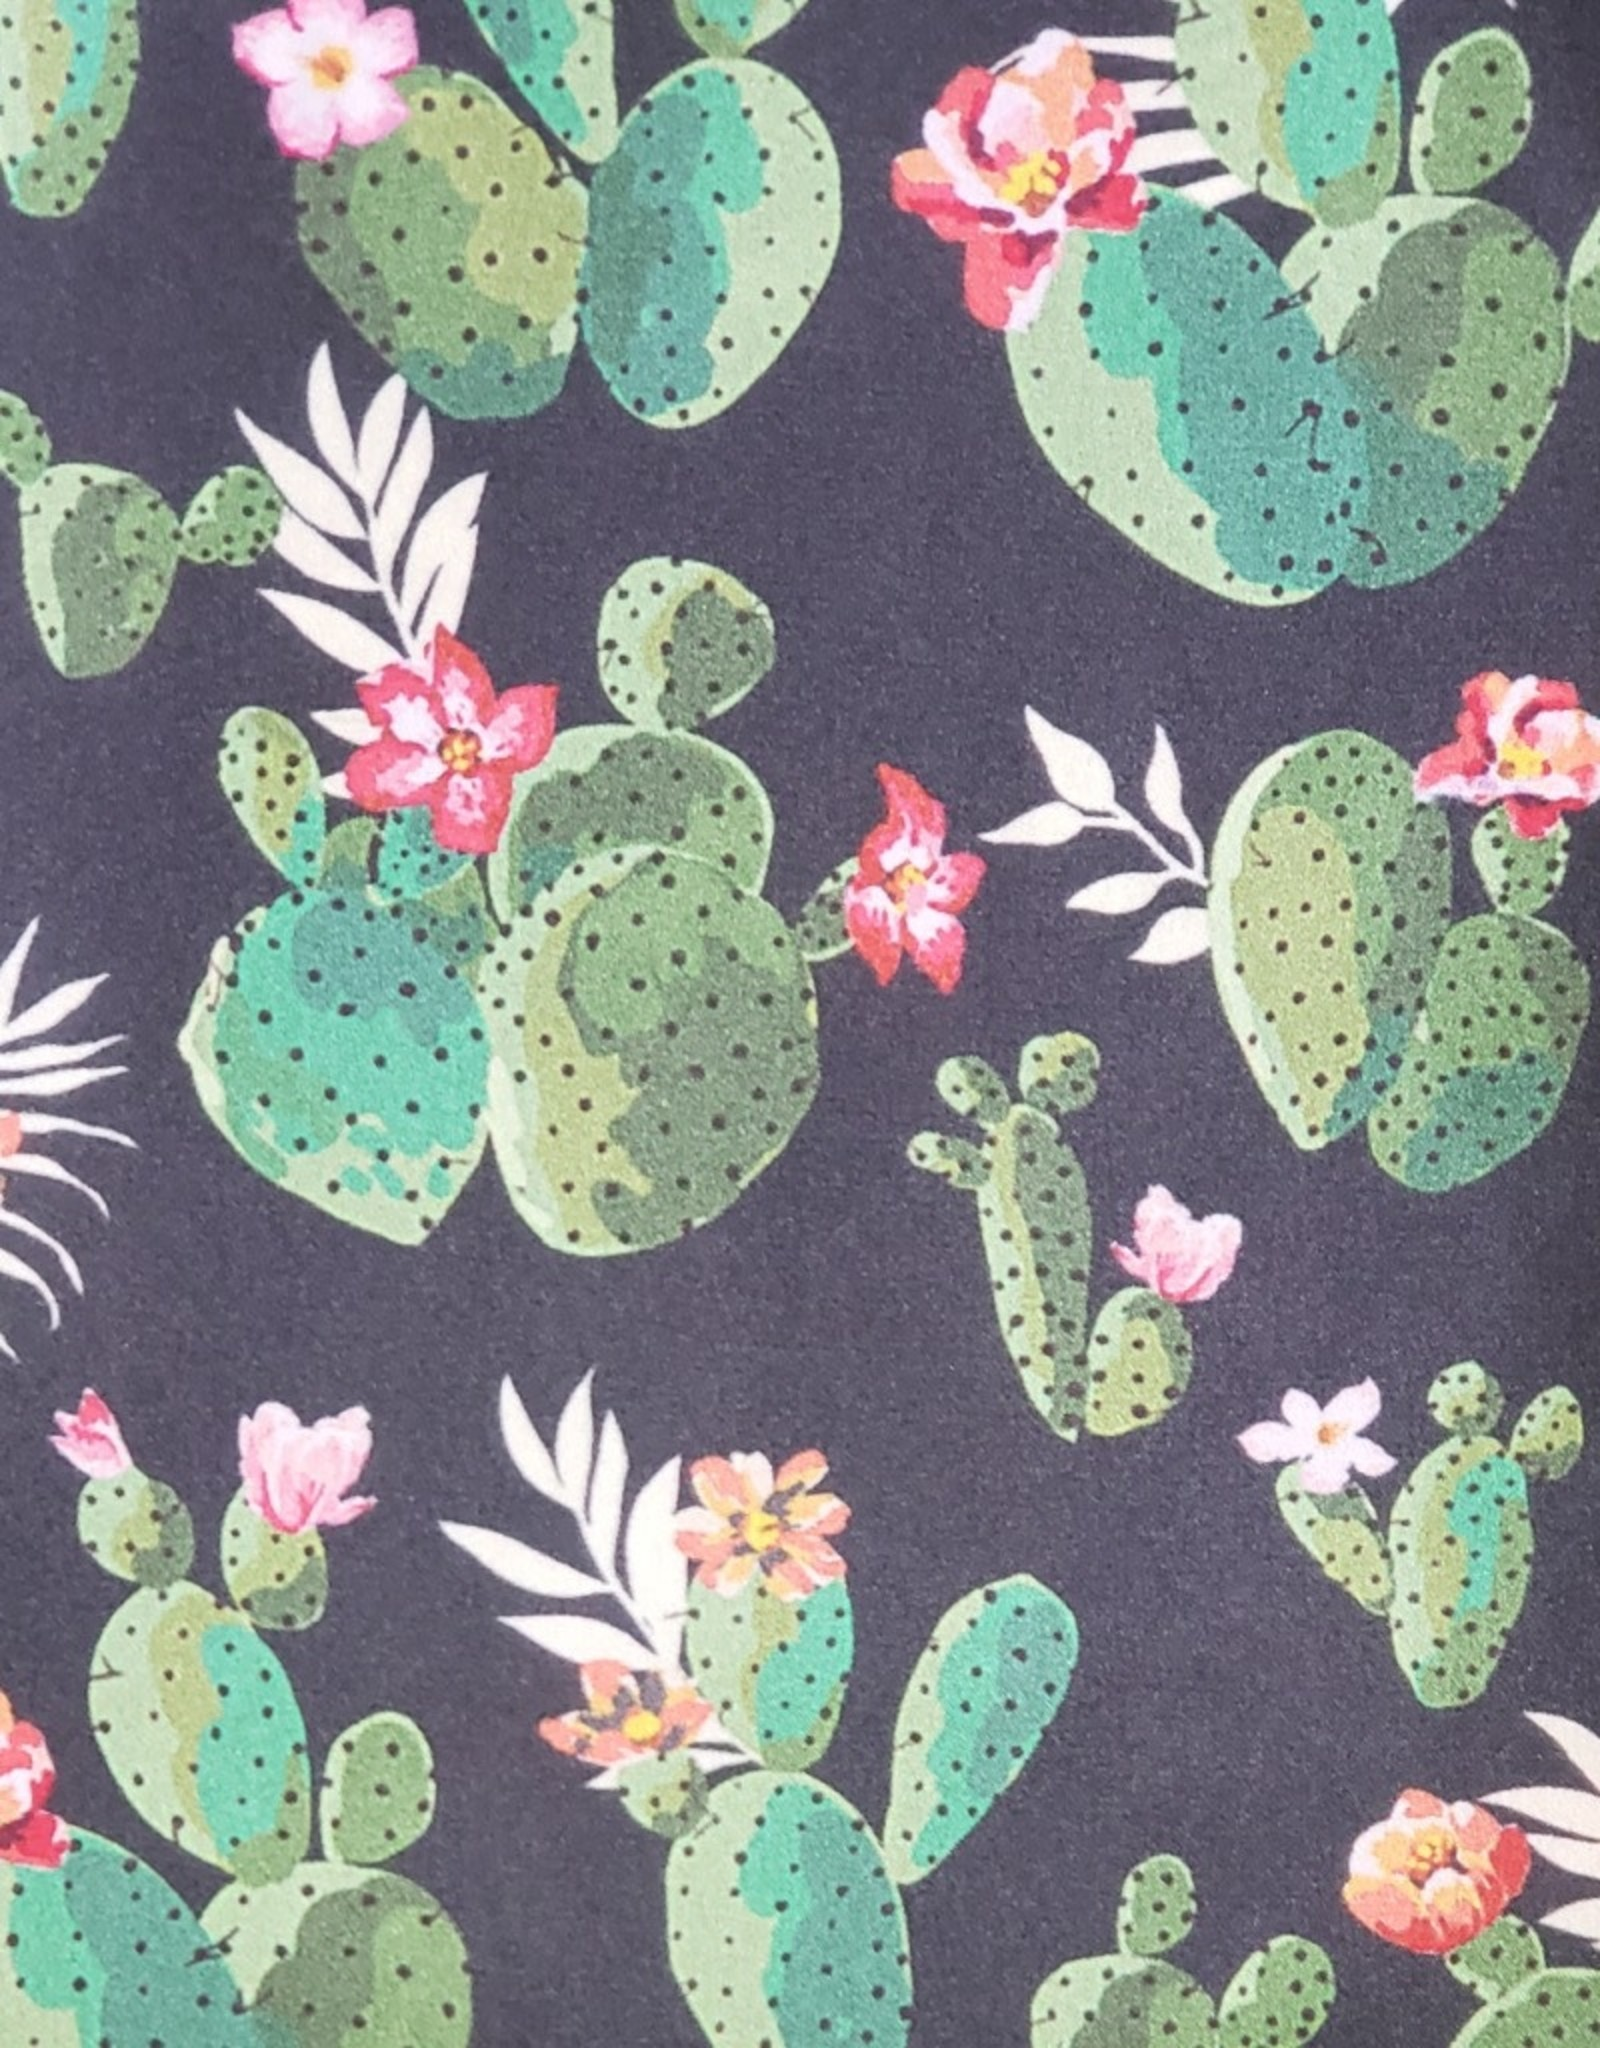 Black with Green Cactus 100% Silk Wild Rag 33x33